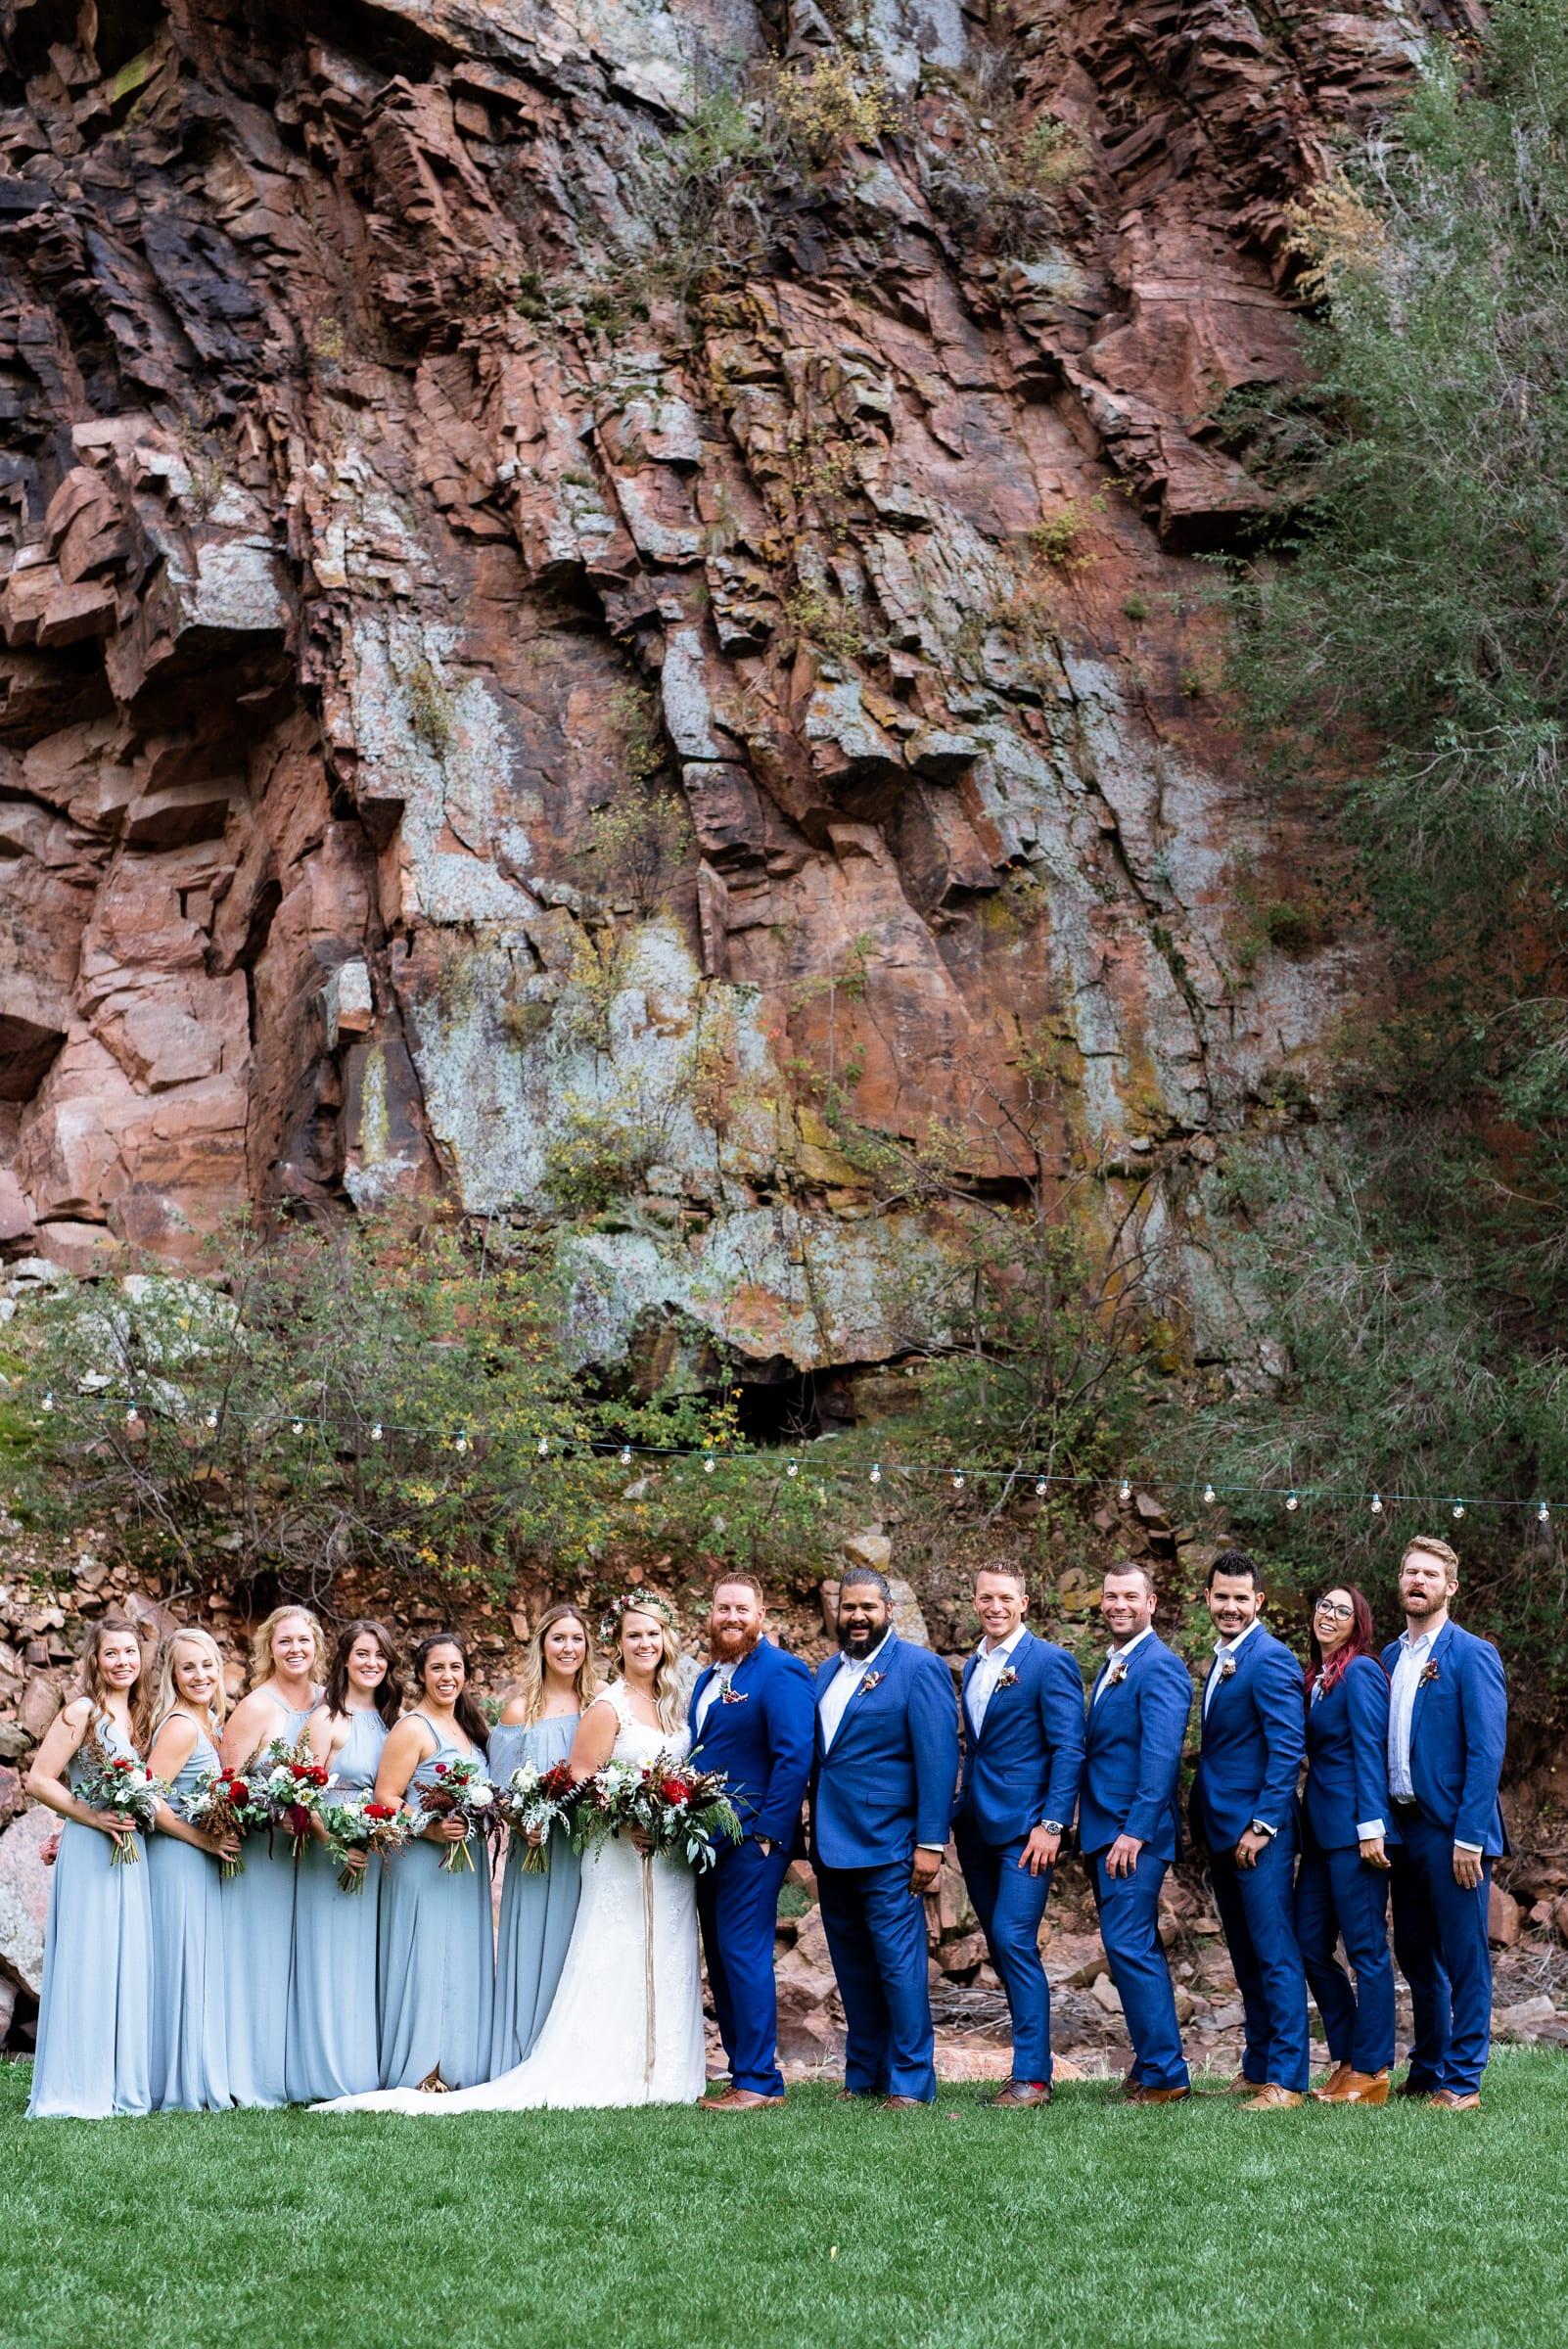 Bridesmaids Style Inspiration at Colorado Wedding | Josie V Photography